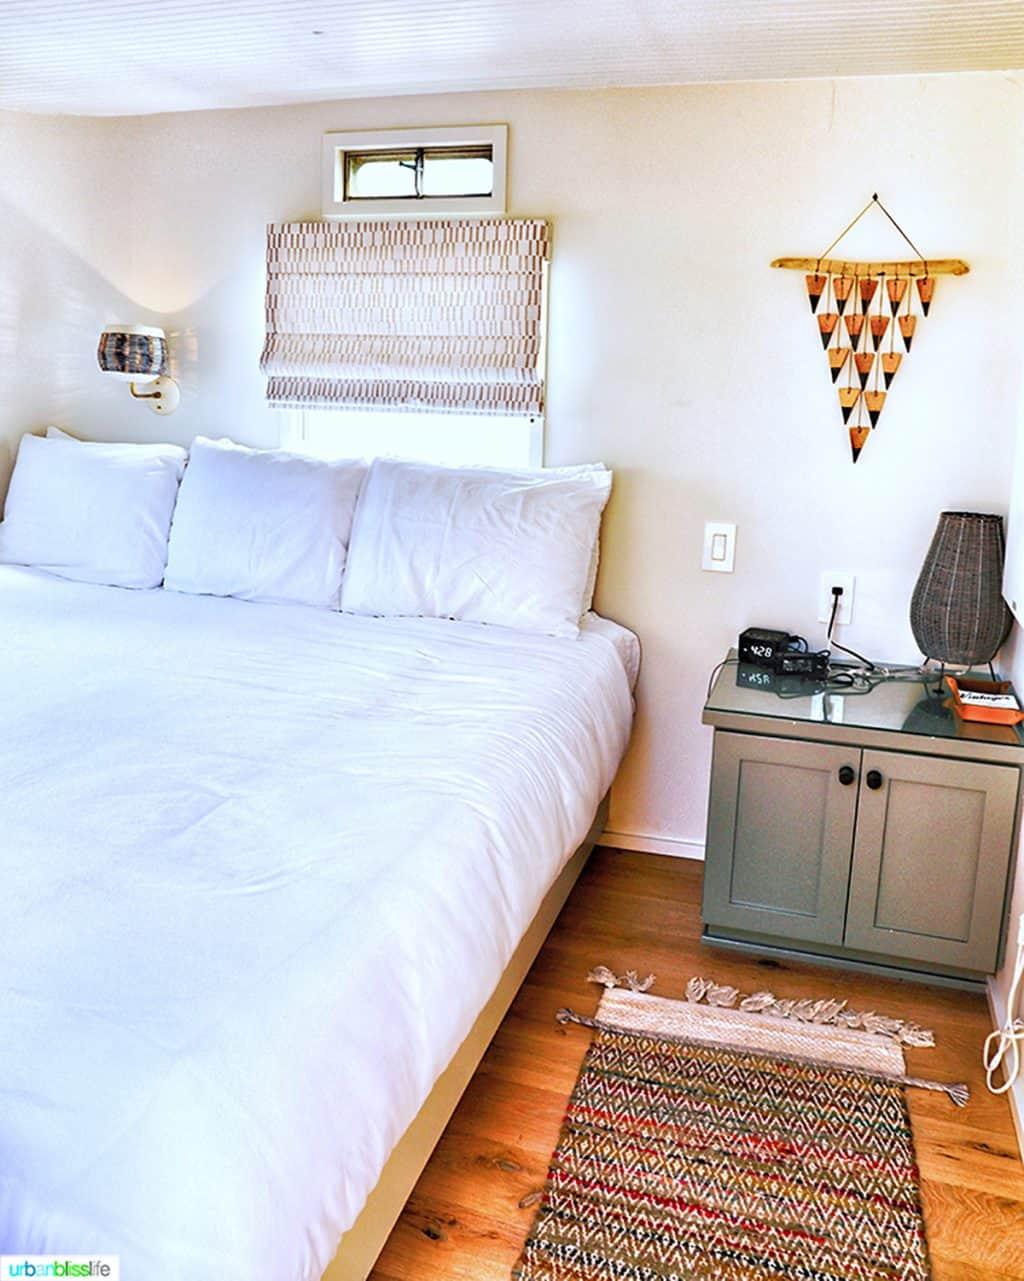 bedroom of mansion airstream at Vintages Trailer Resort